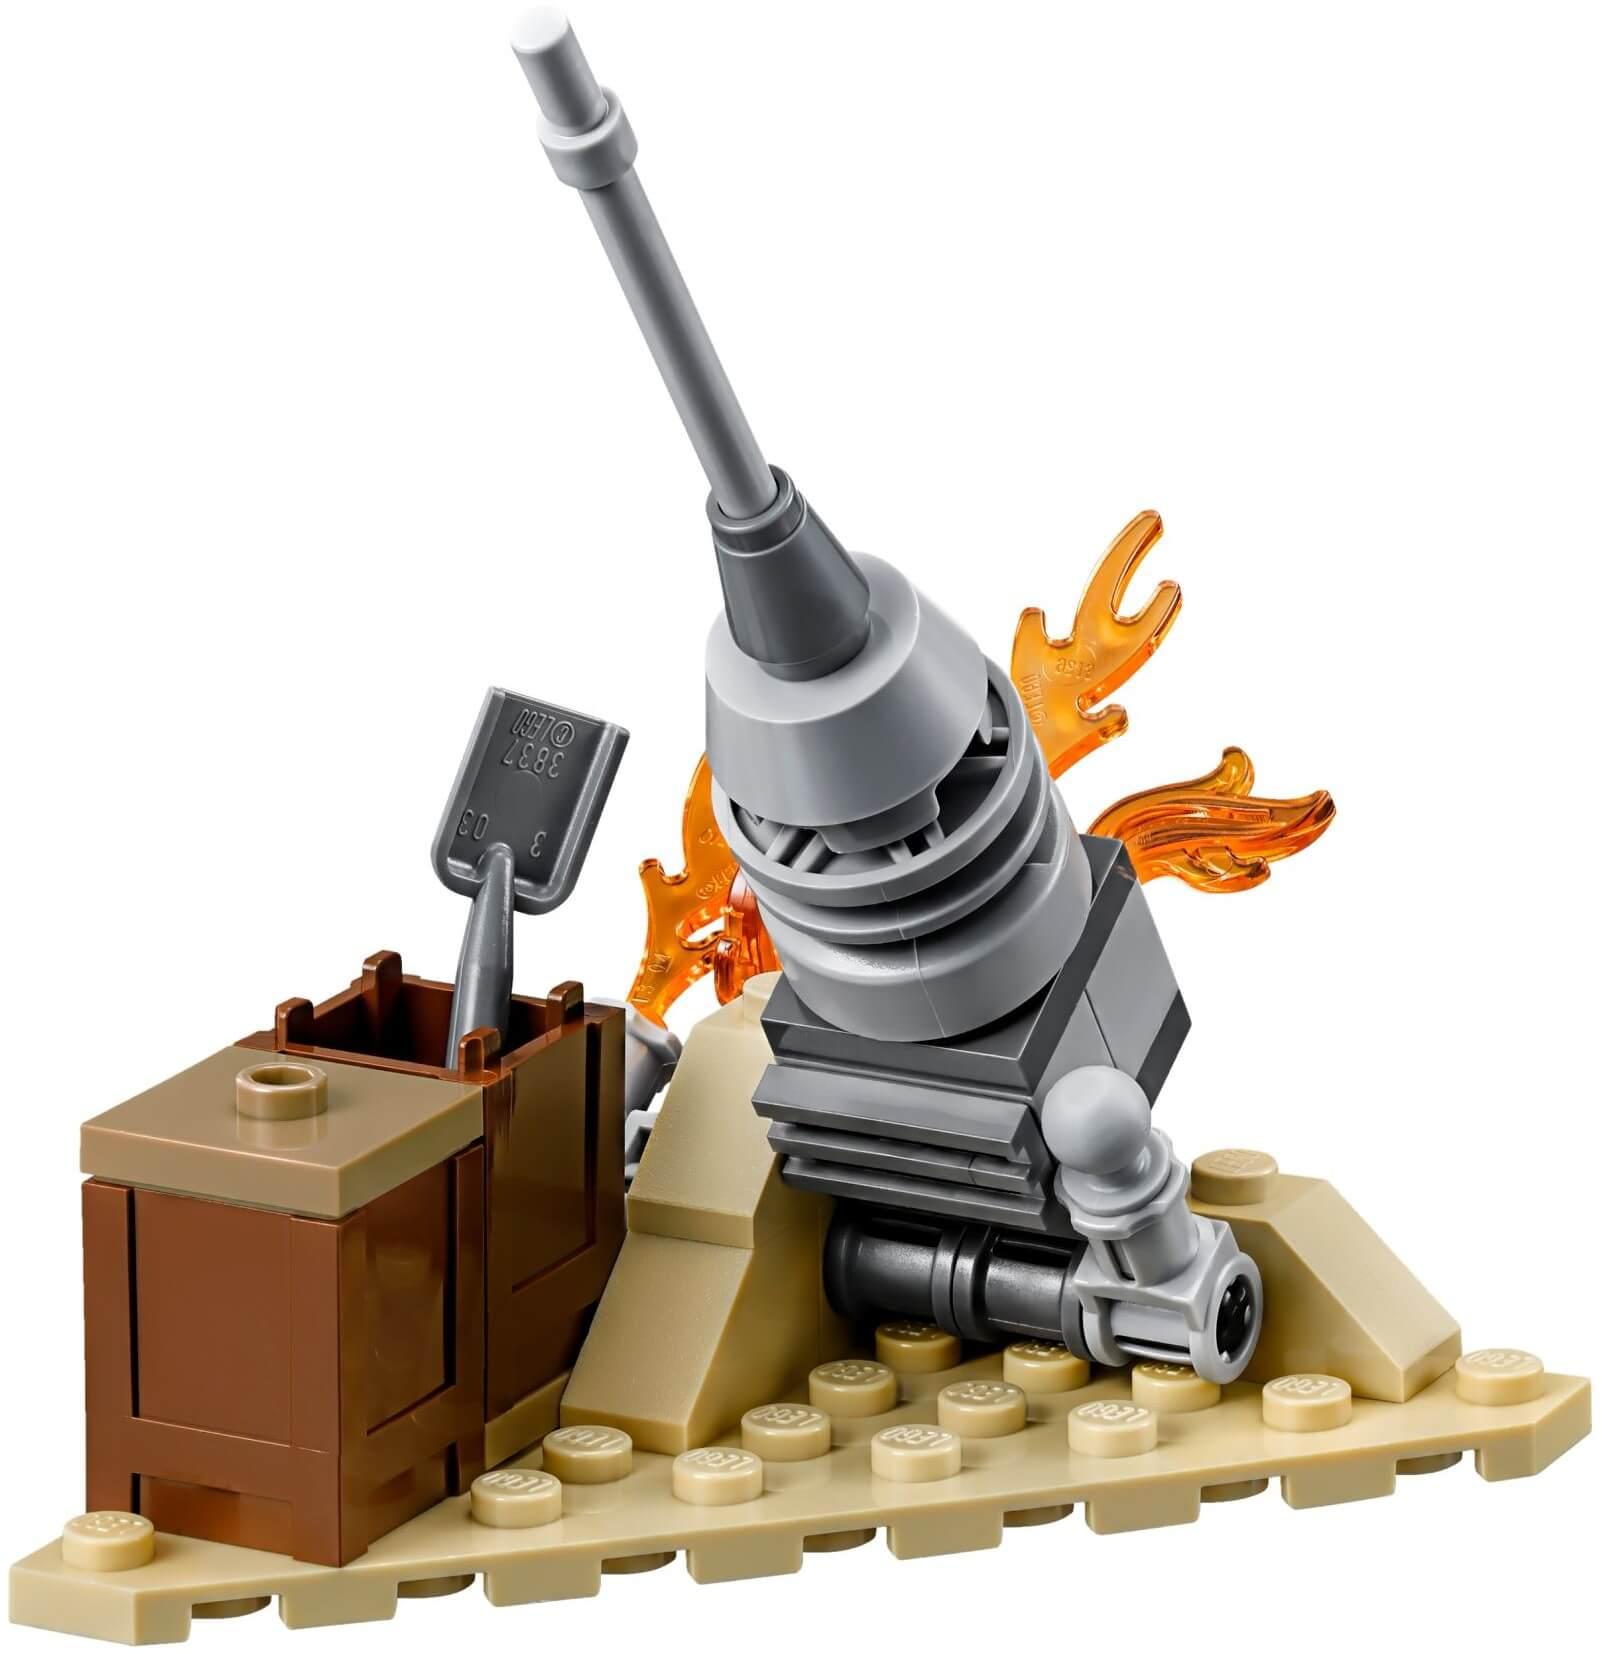 Mua đồ chơi LEGO 75149 - LEGO Star Wars 75149 - Máy bay X-Wing của Quân Kháng Chiến (LEGO Star Wars Resistance X-Wing Fighter 75149)